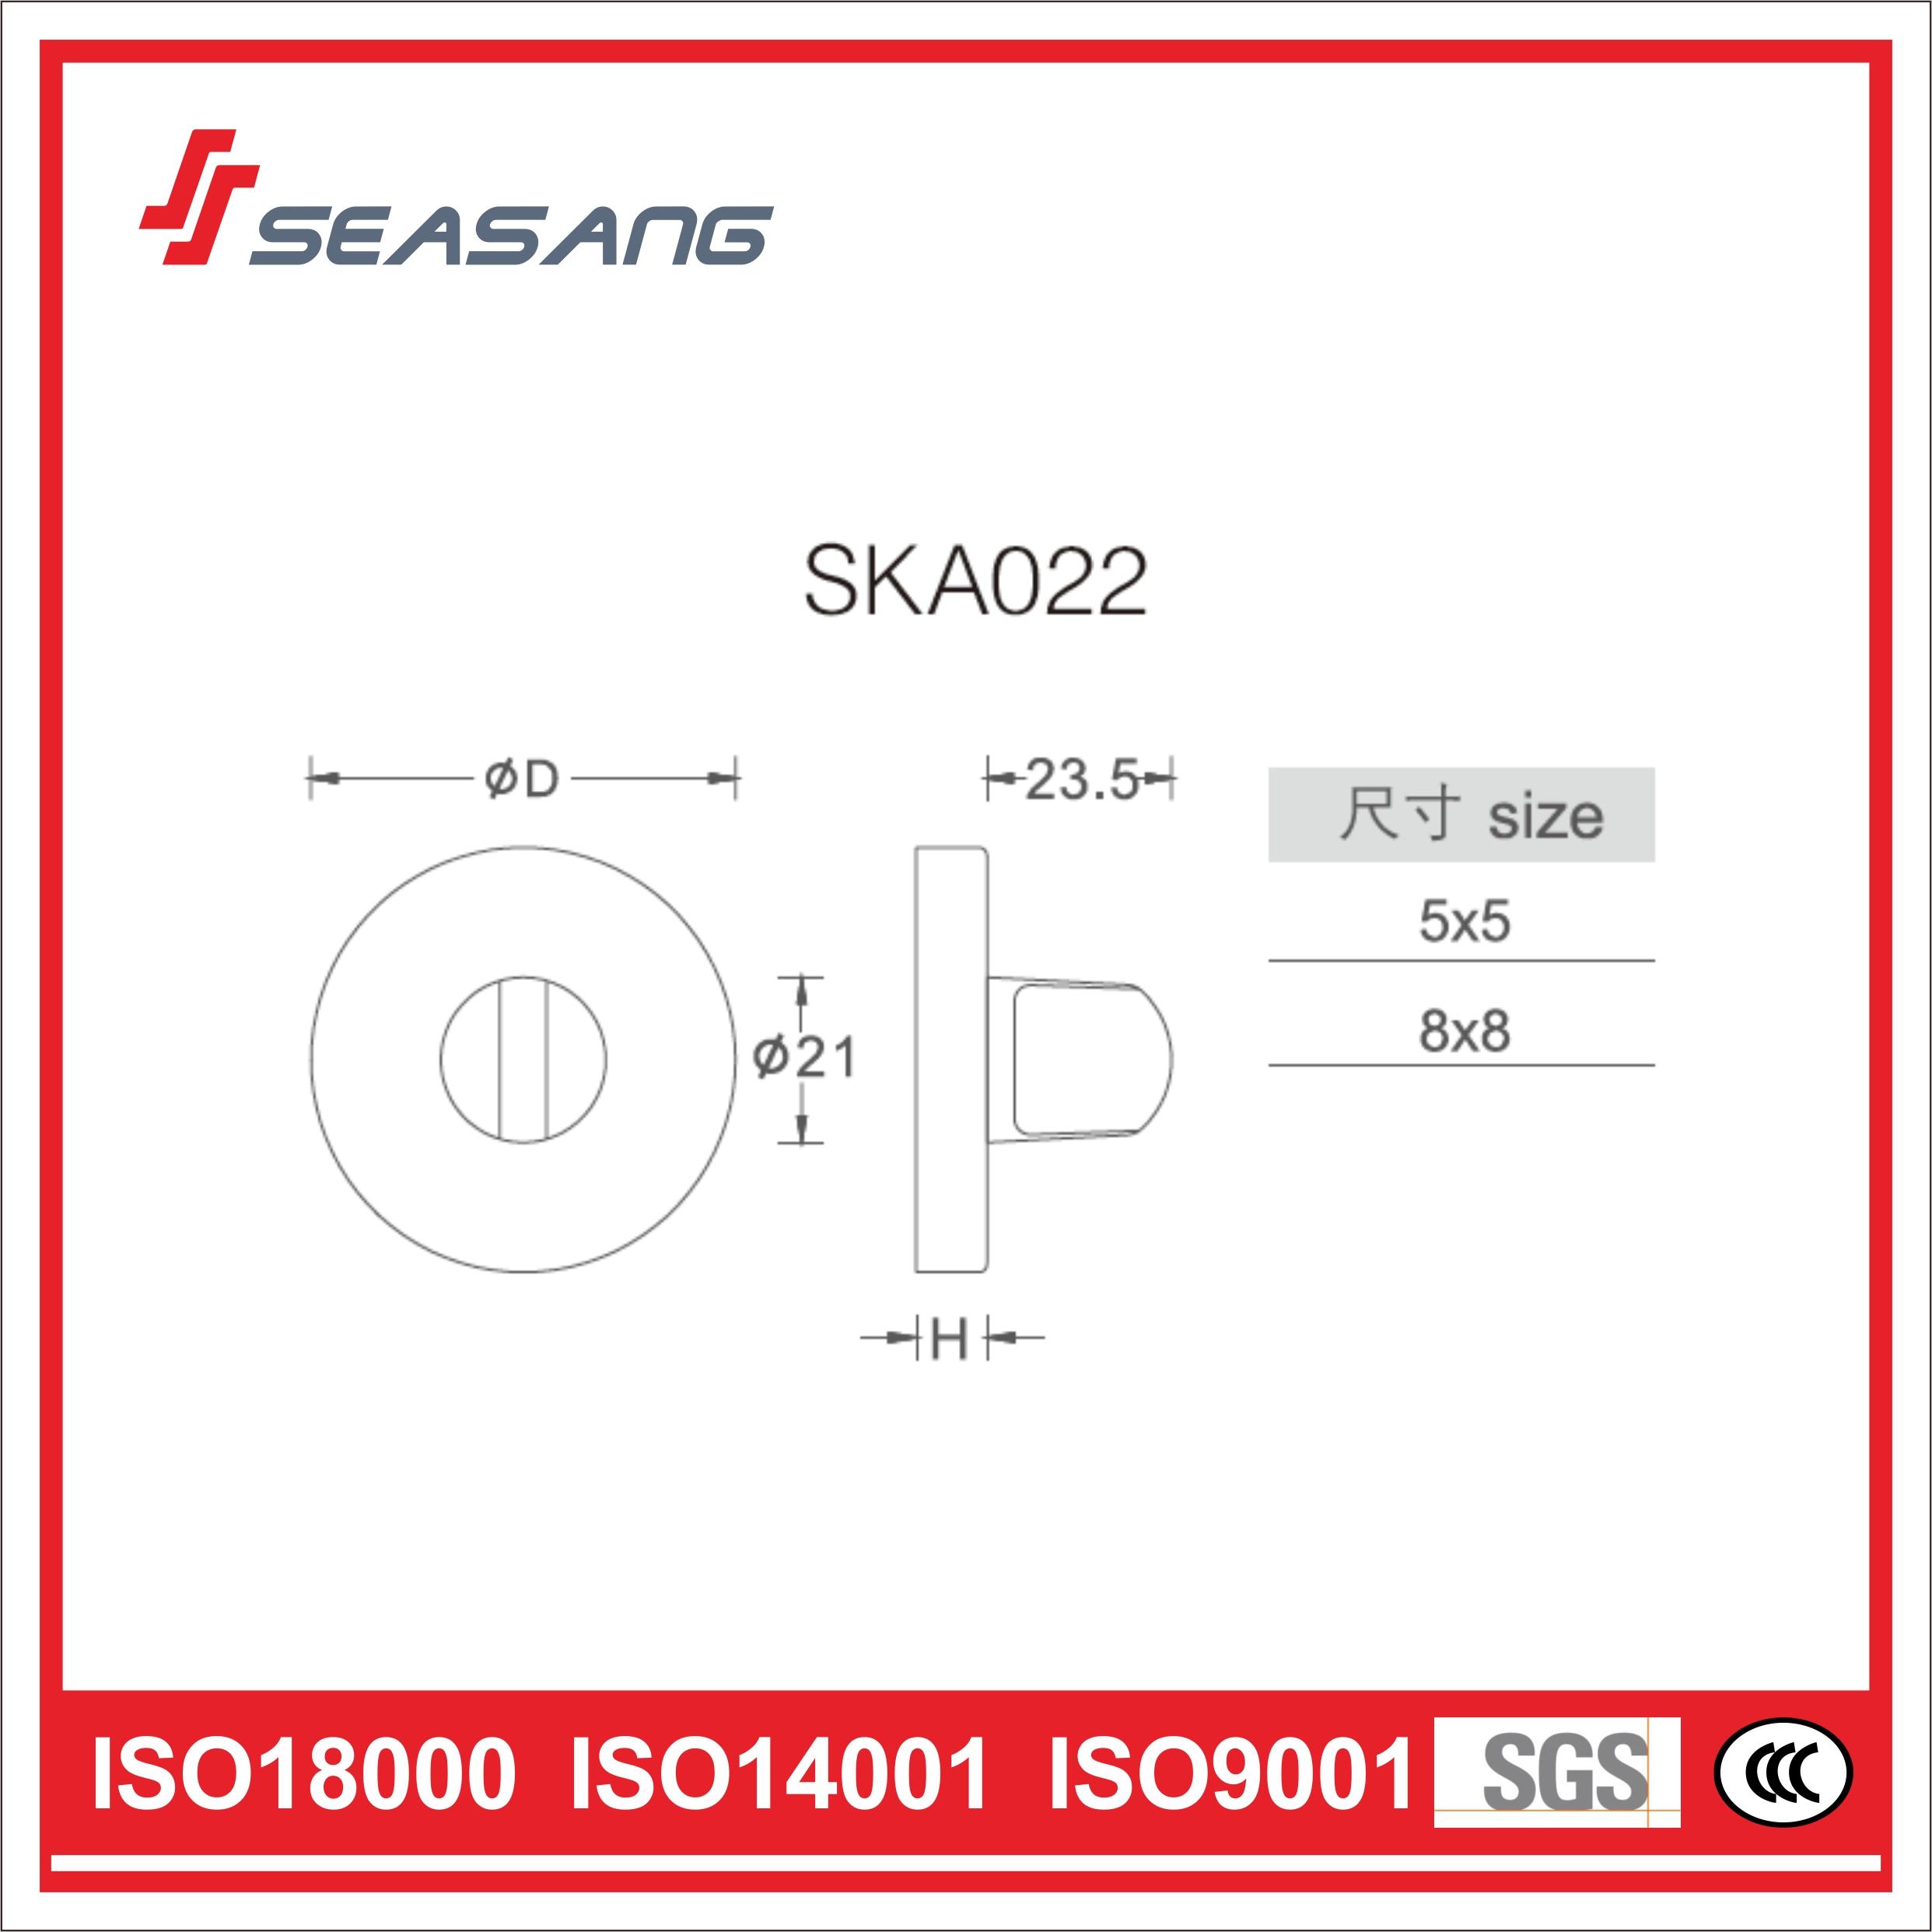 Stainless Steel Bathroom Handle Ska022